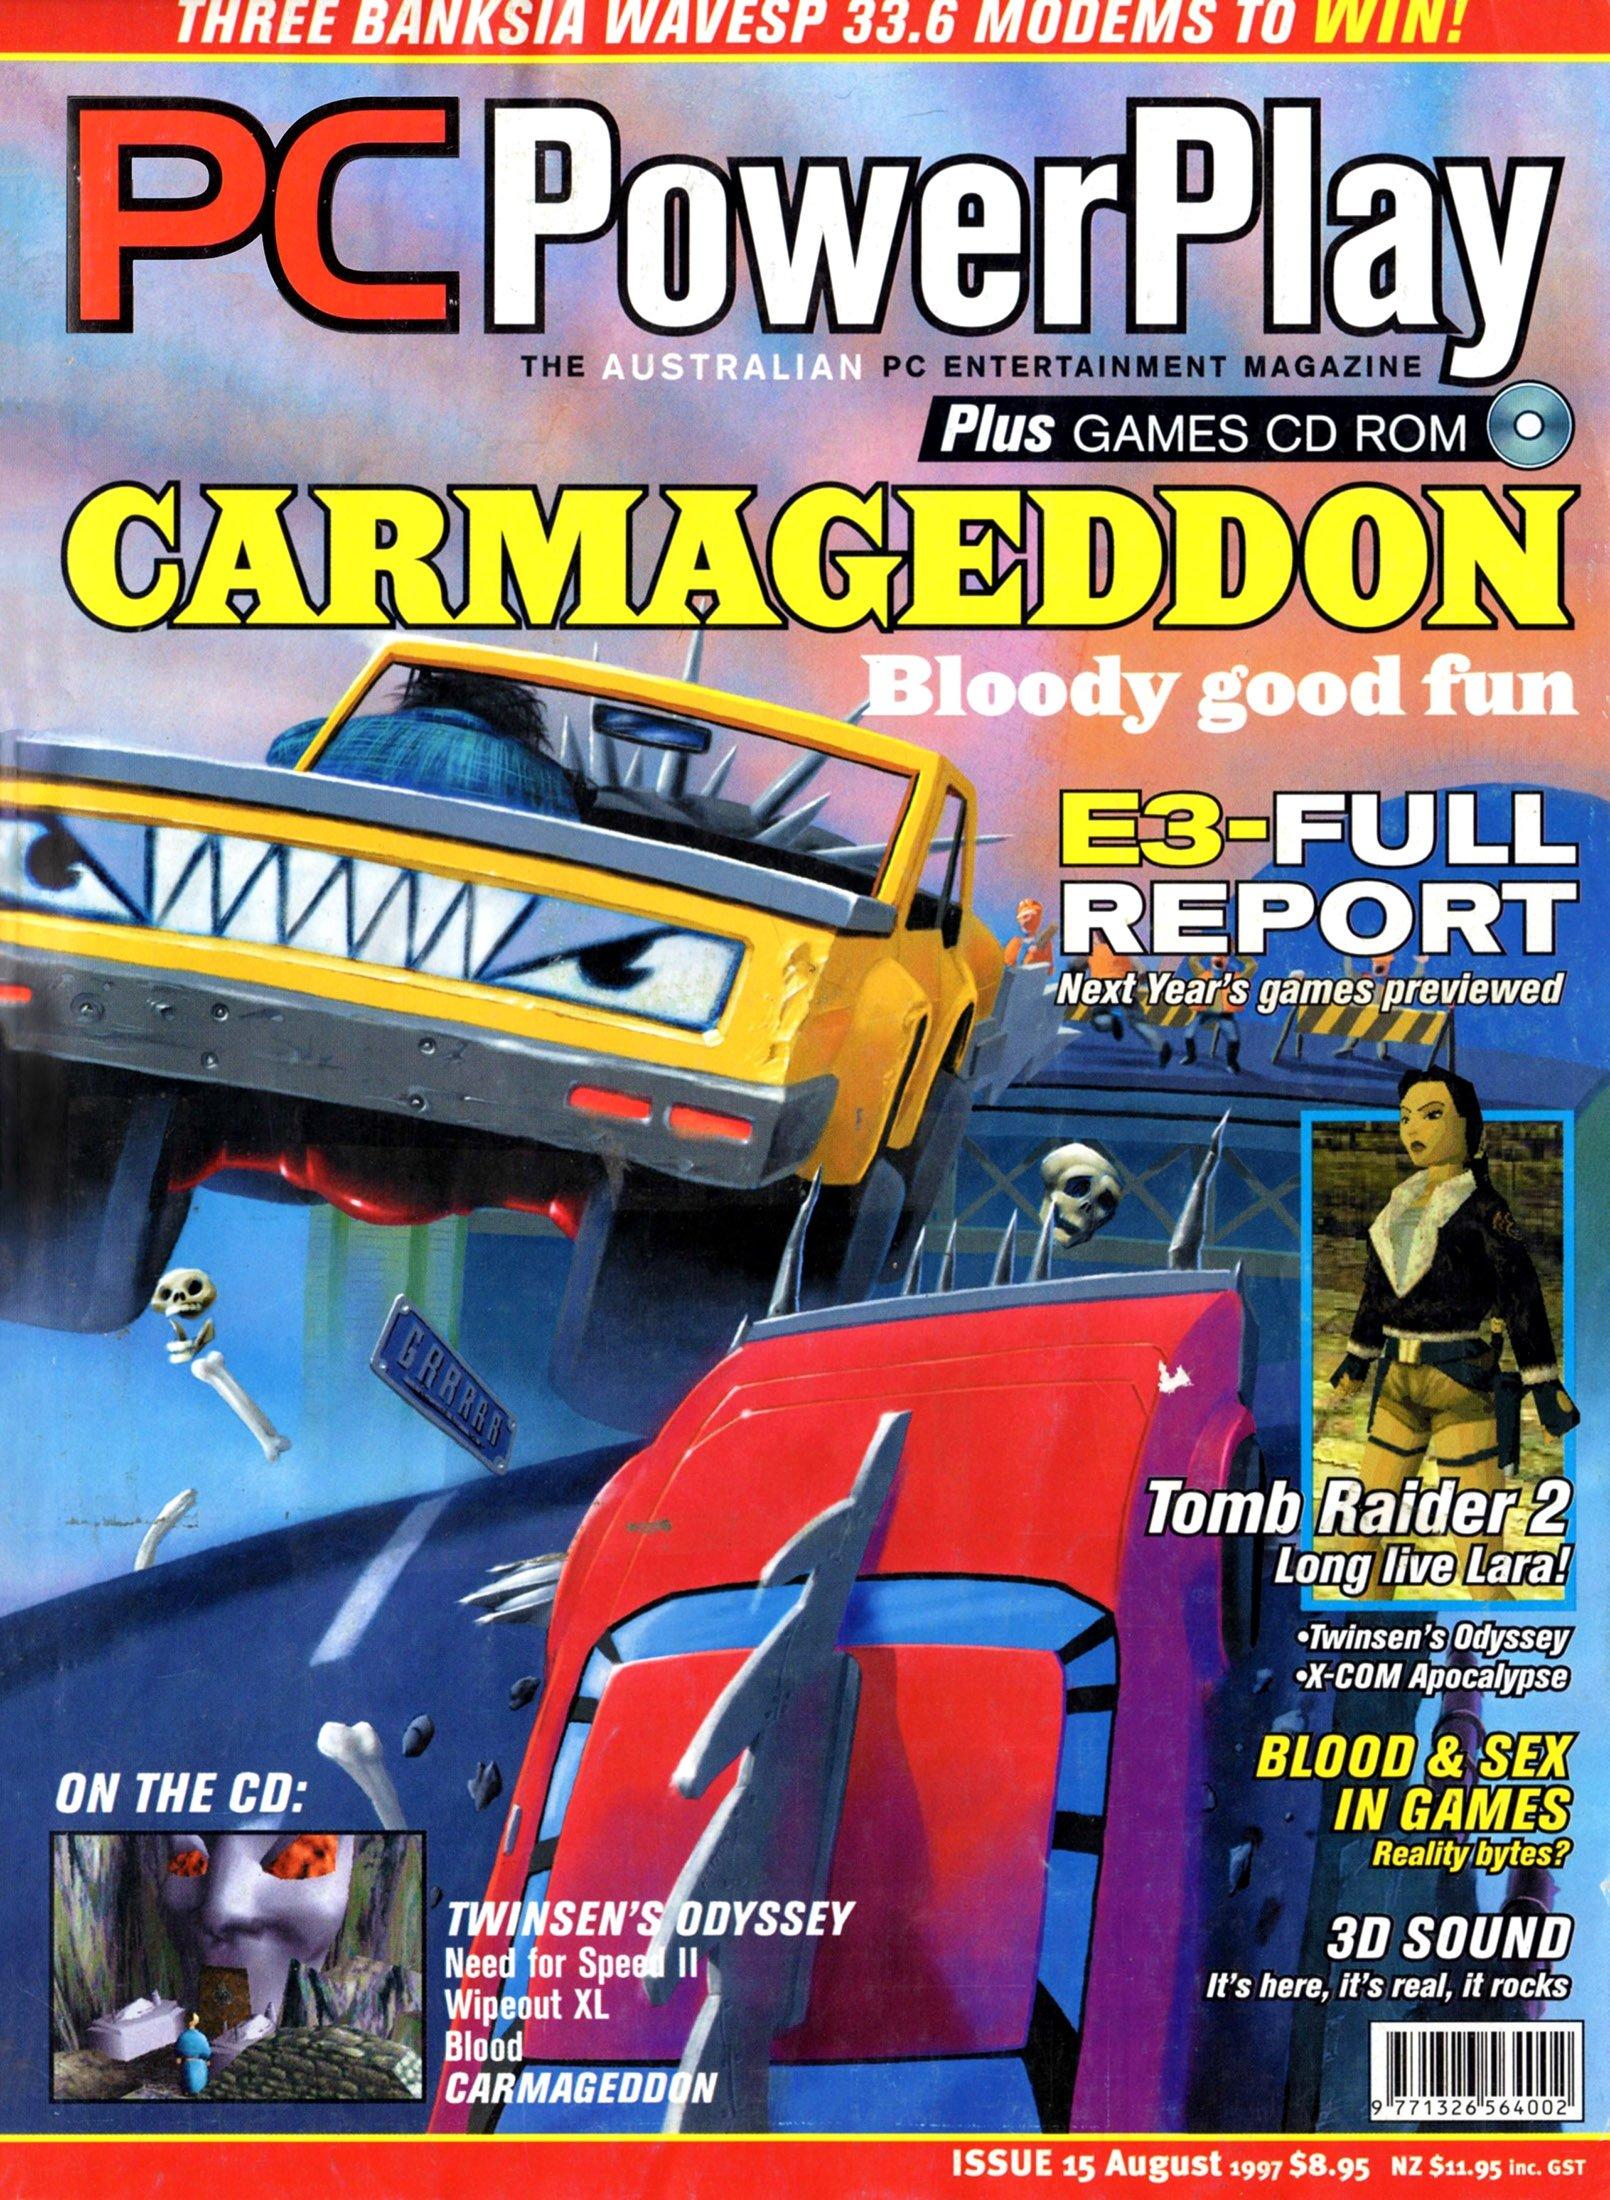 PC PowerPlay 015 (August 1997)